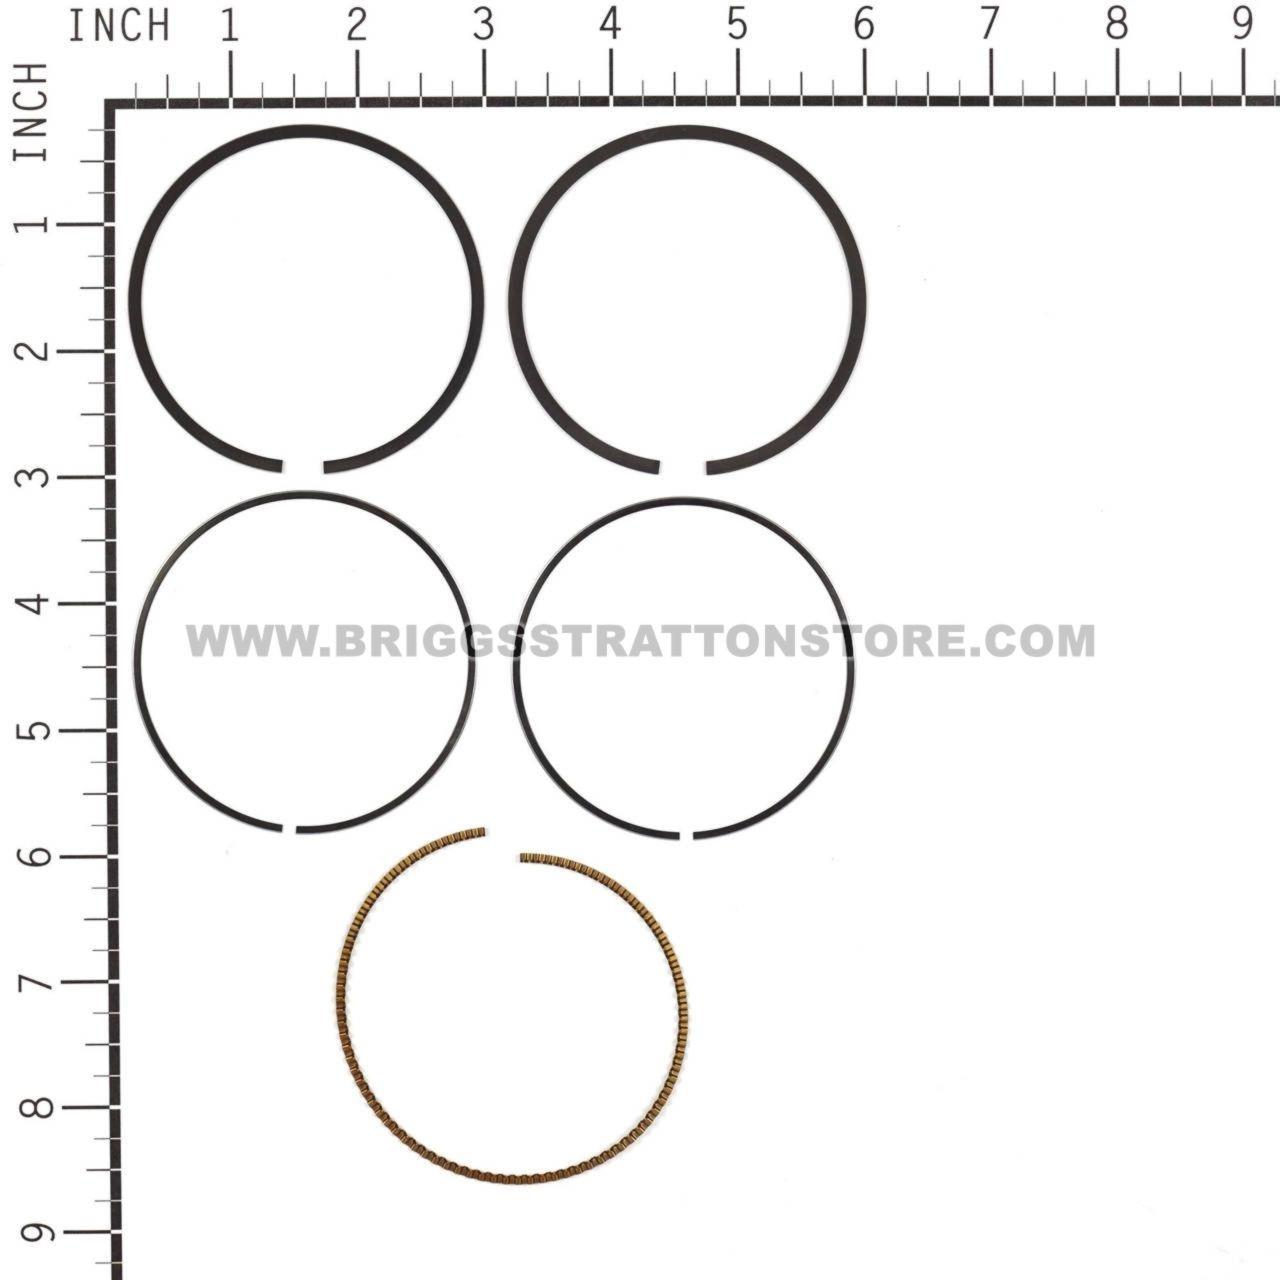 Briggs /& Stratton 795431 Ring Set